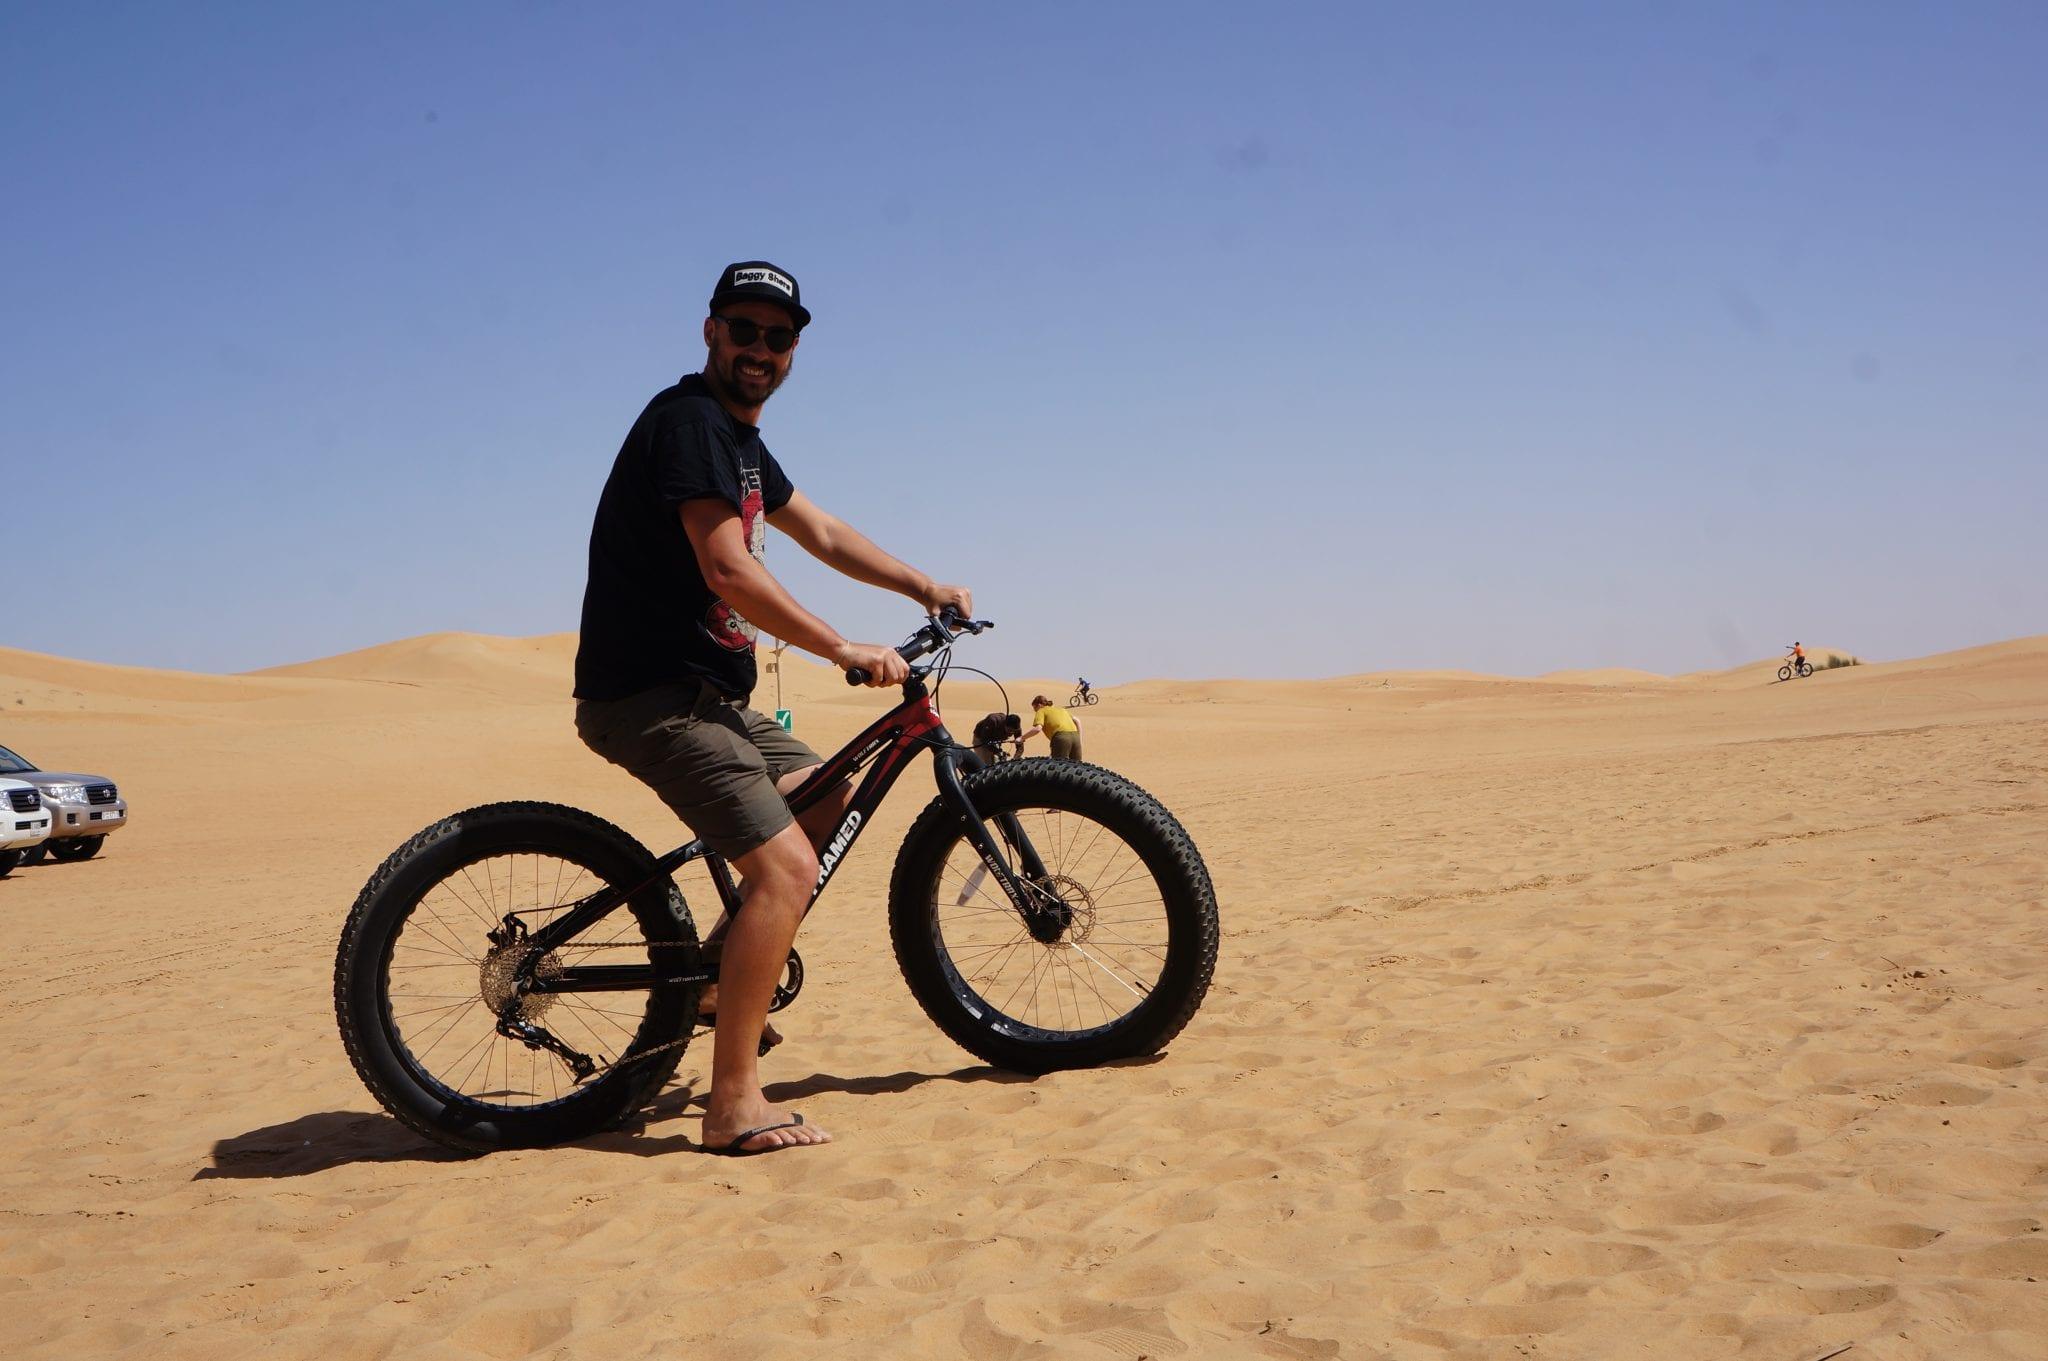 riding a desert bike in dubai